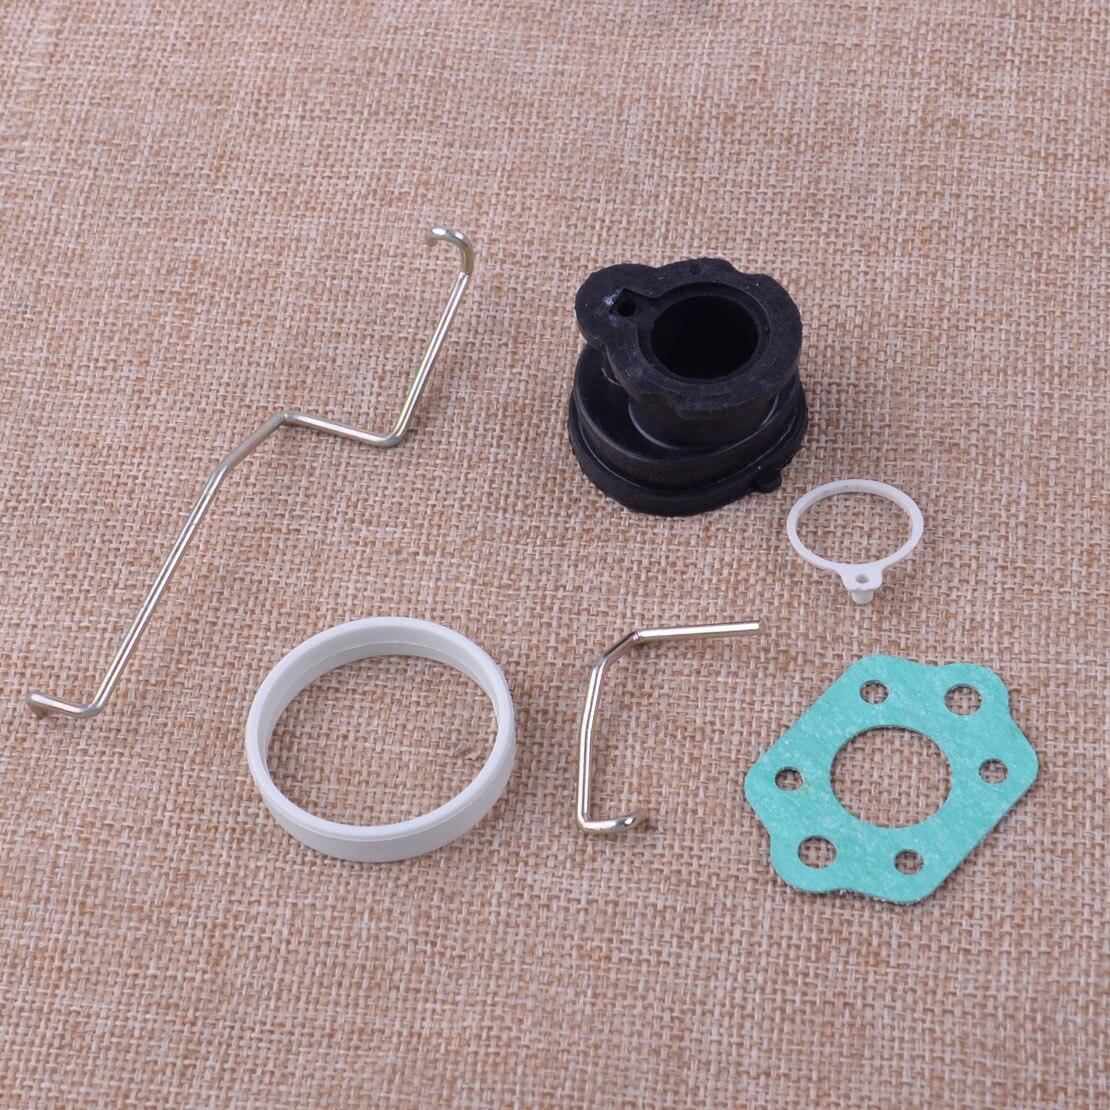 LEATOSK 6pcs/Set Throttle Lever & Choke Rod & Intake Manifold &Gasket Fit For STIHL MS180 MS180C MS170 017 018